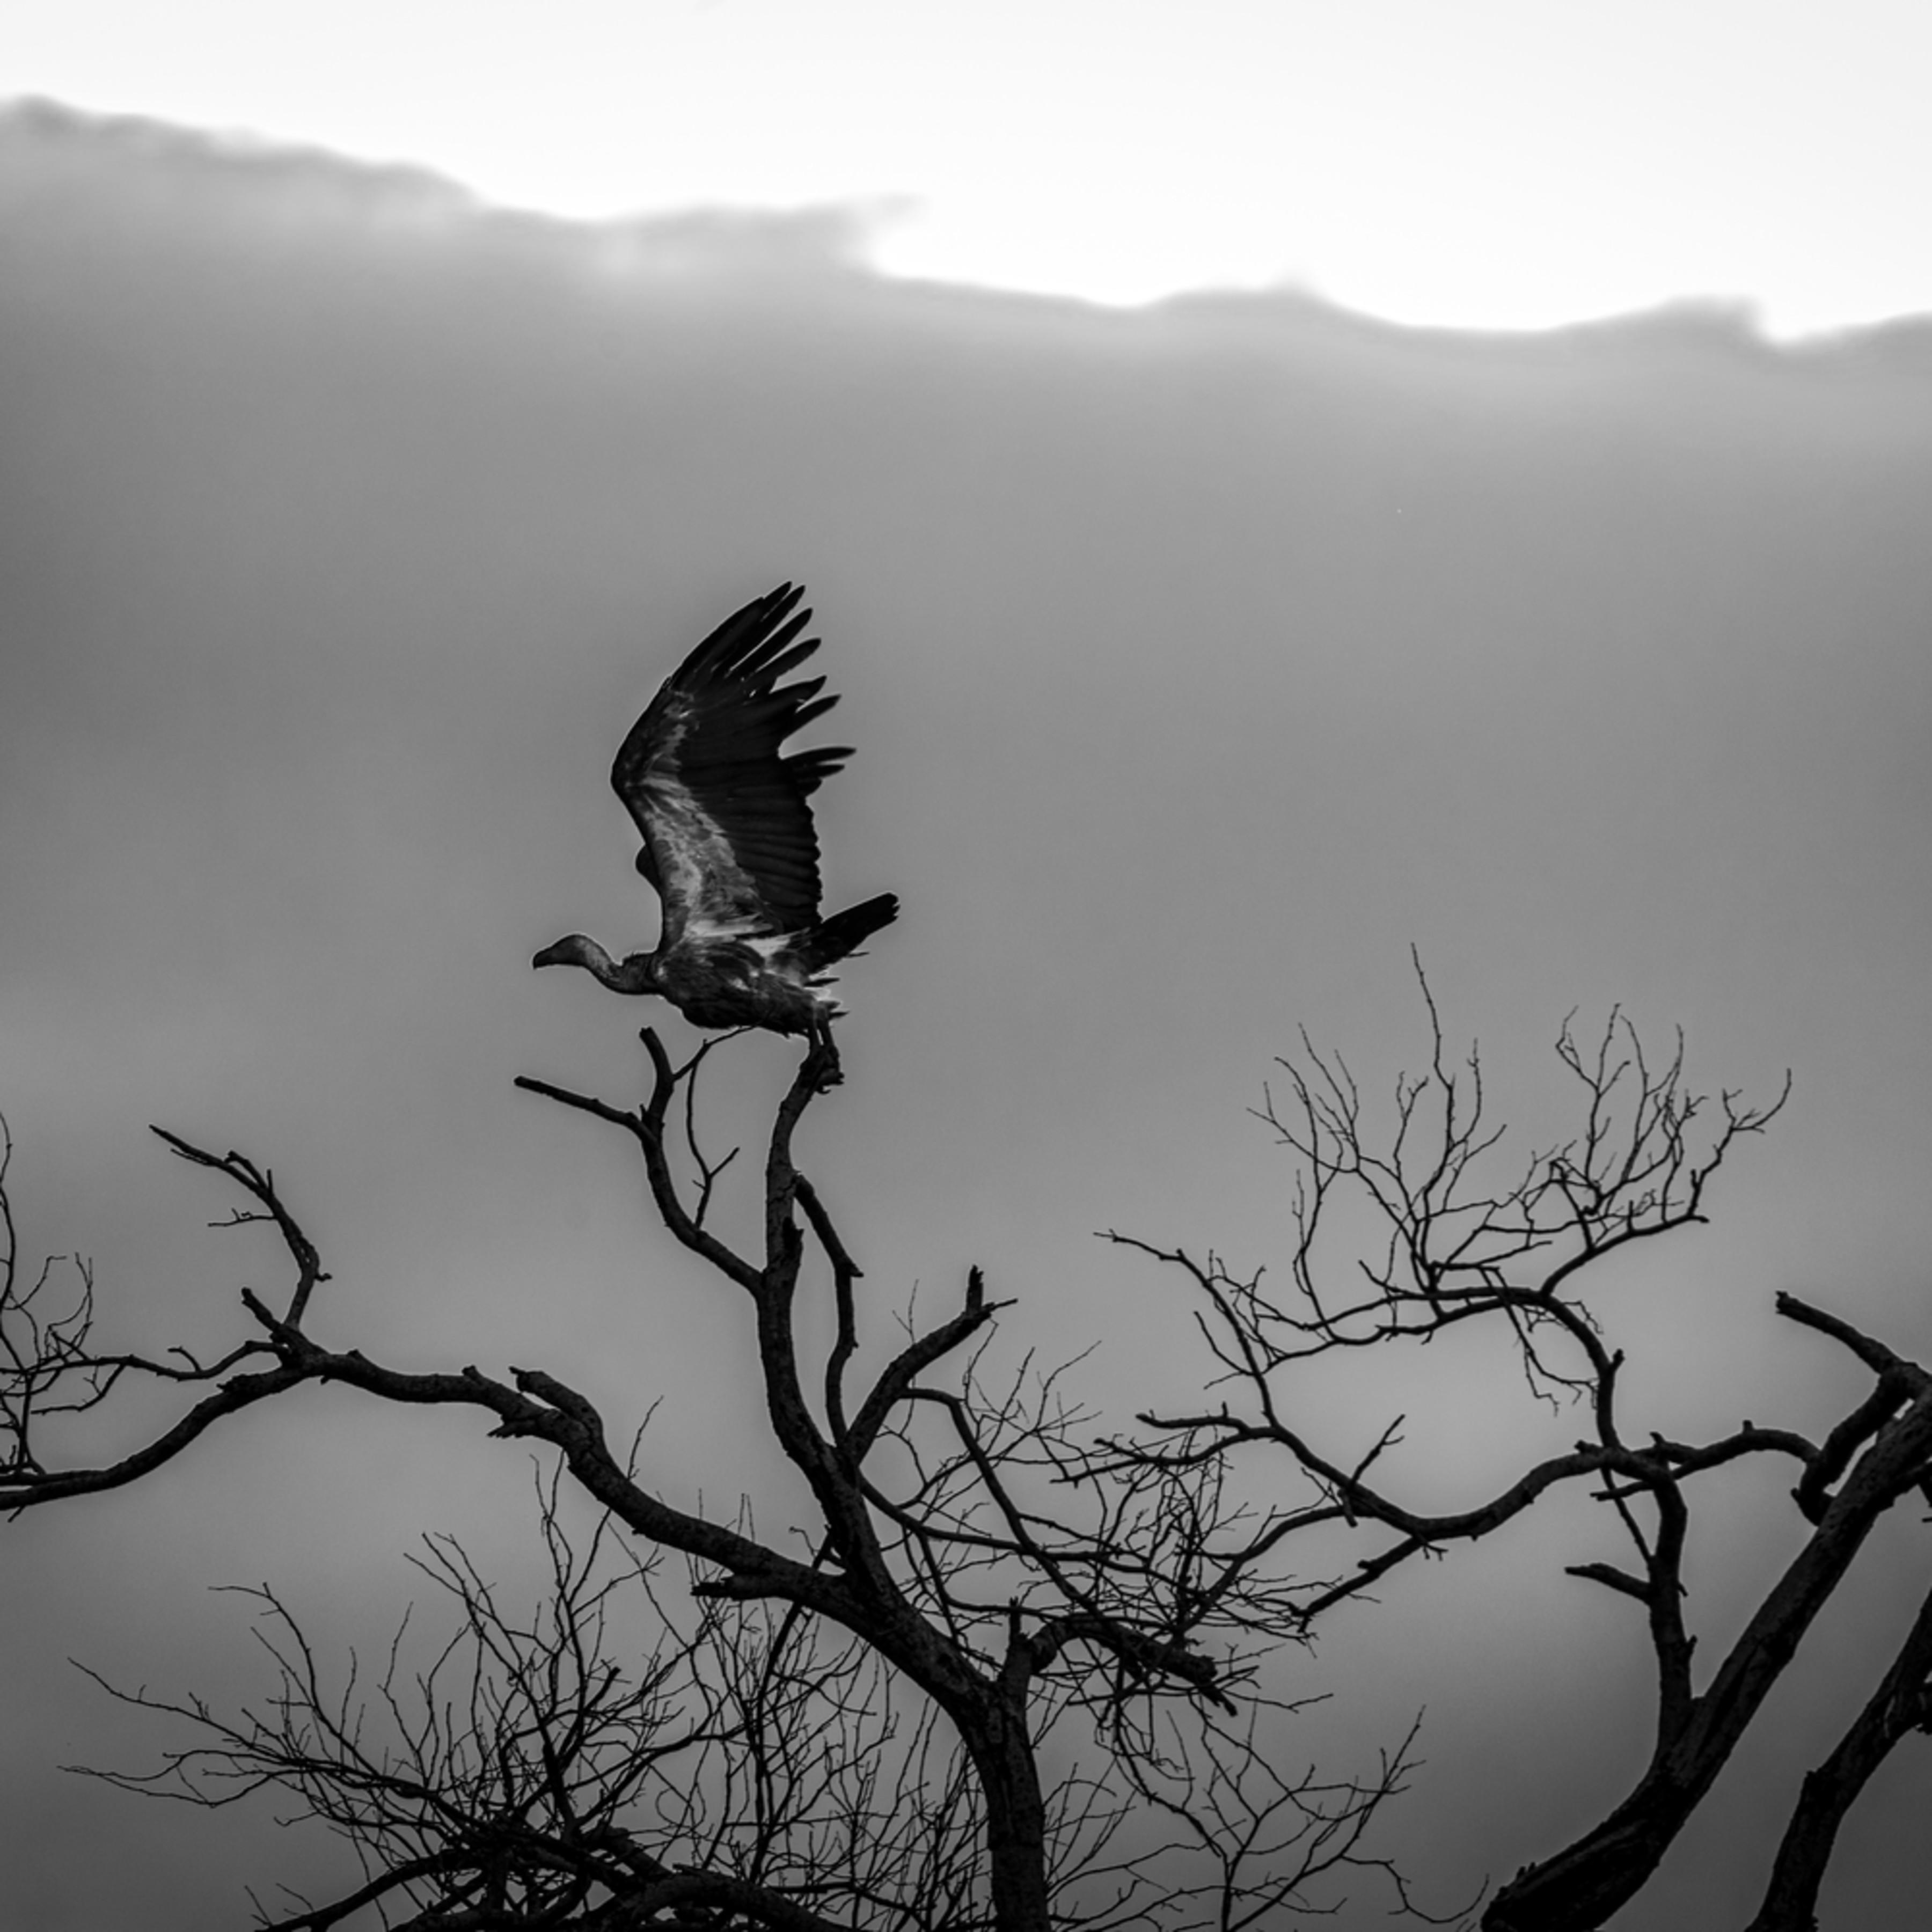 Cape griffon vulture 12x18 sig xp9iih